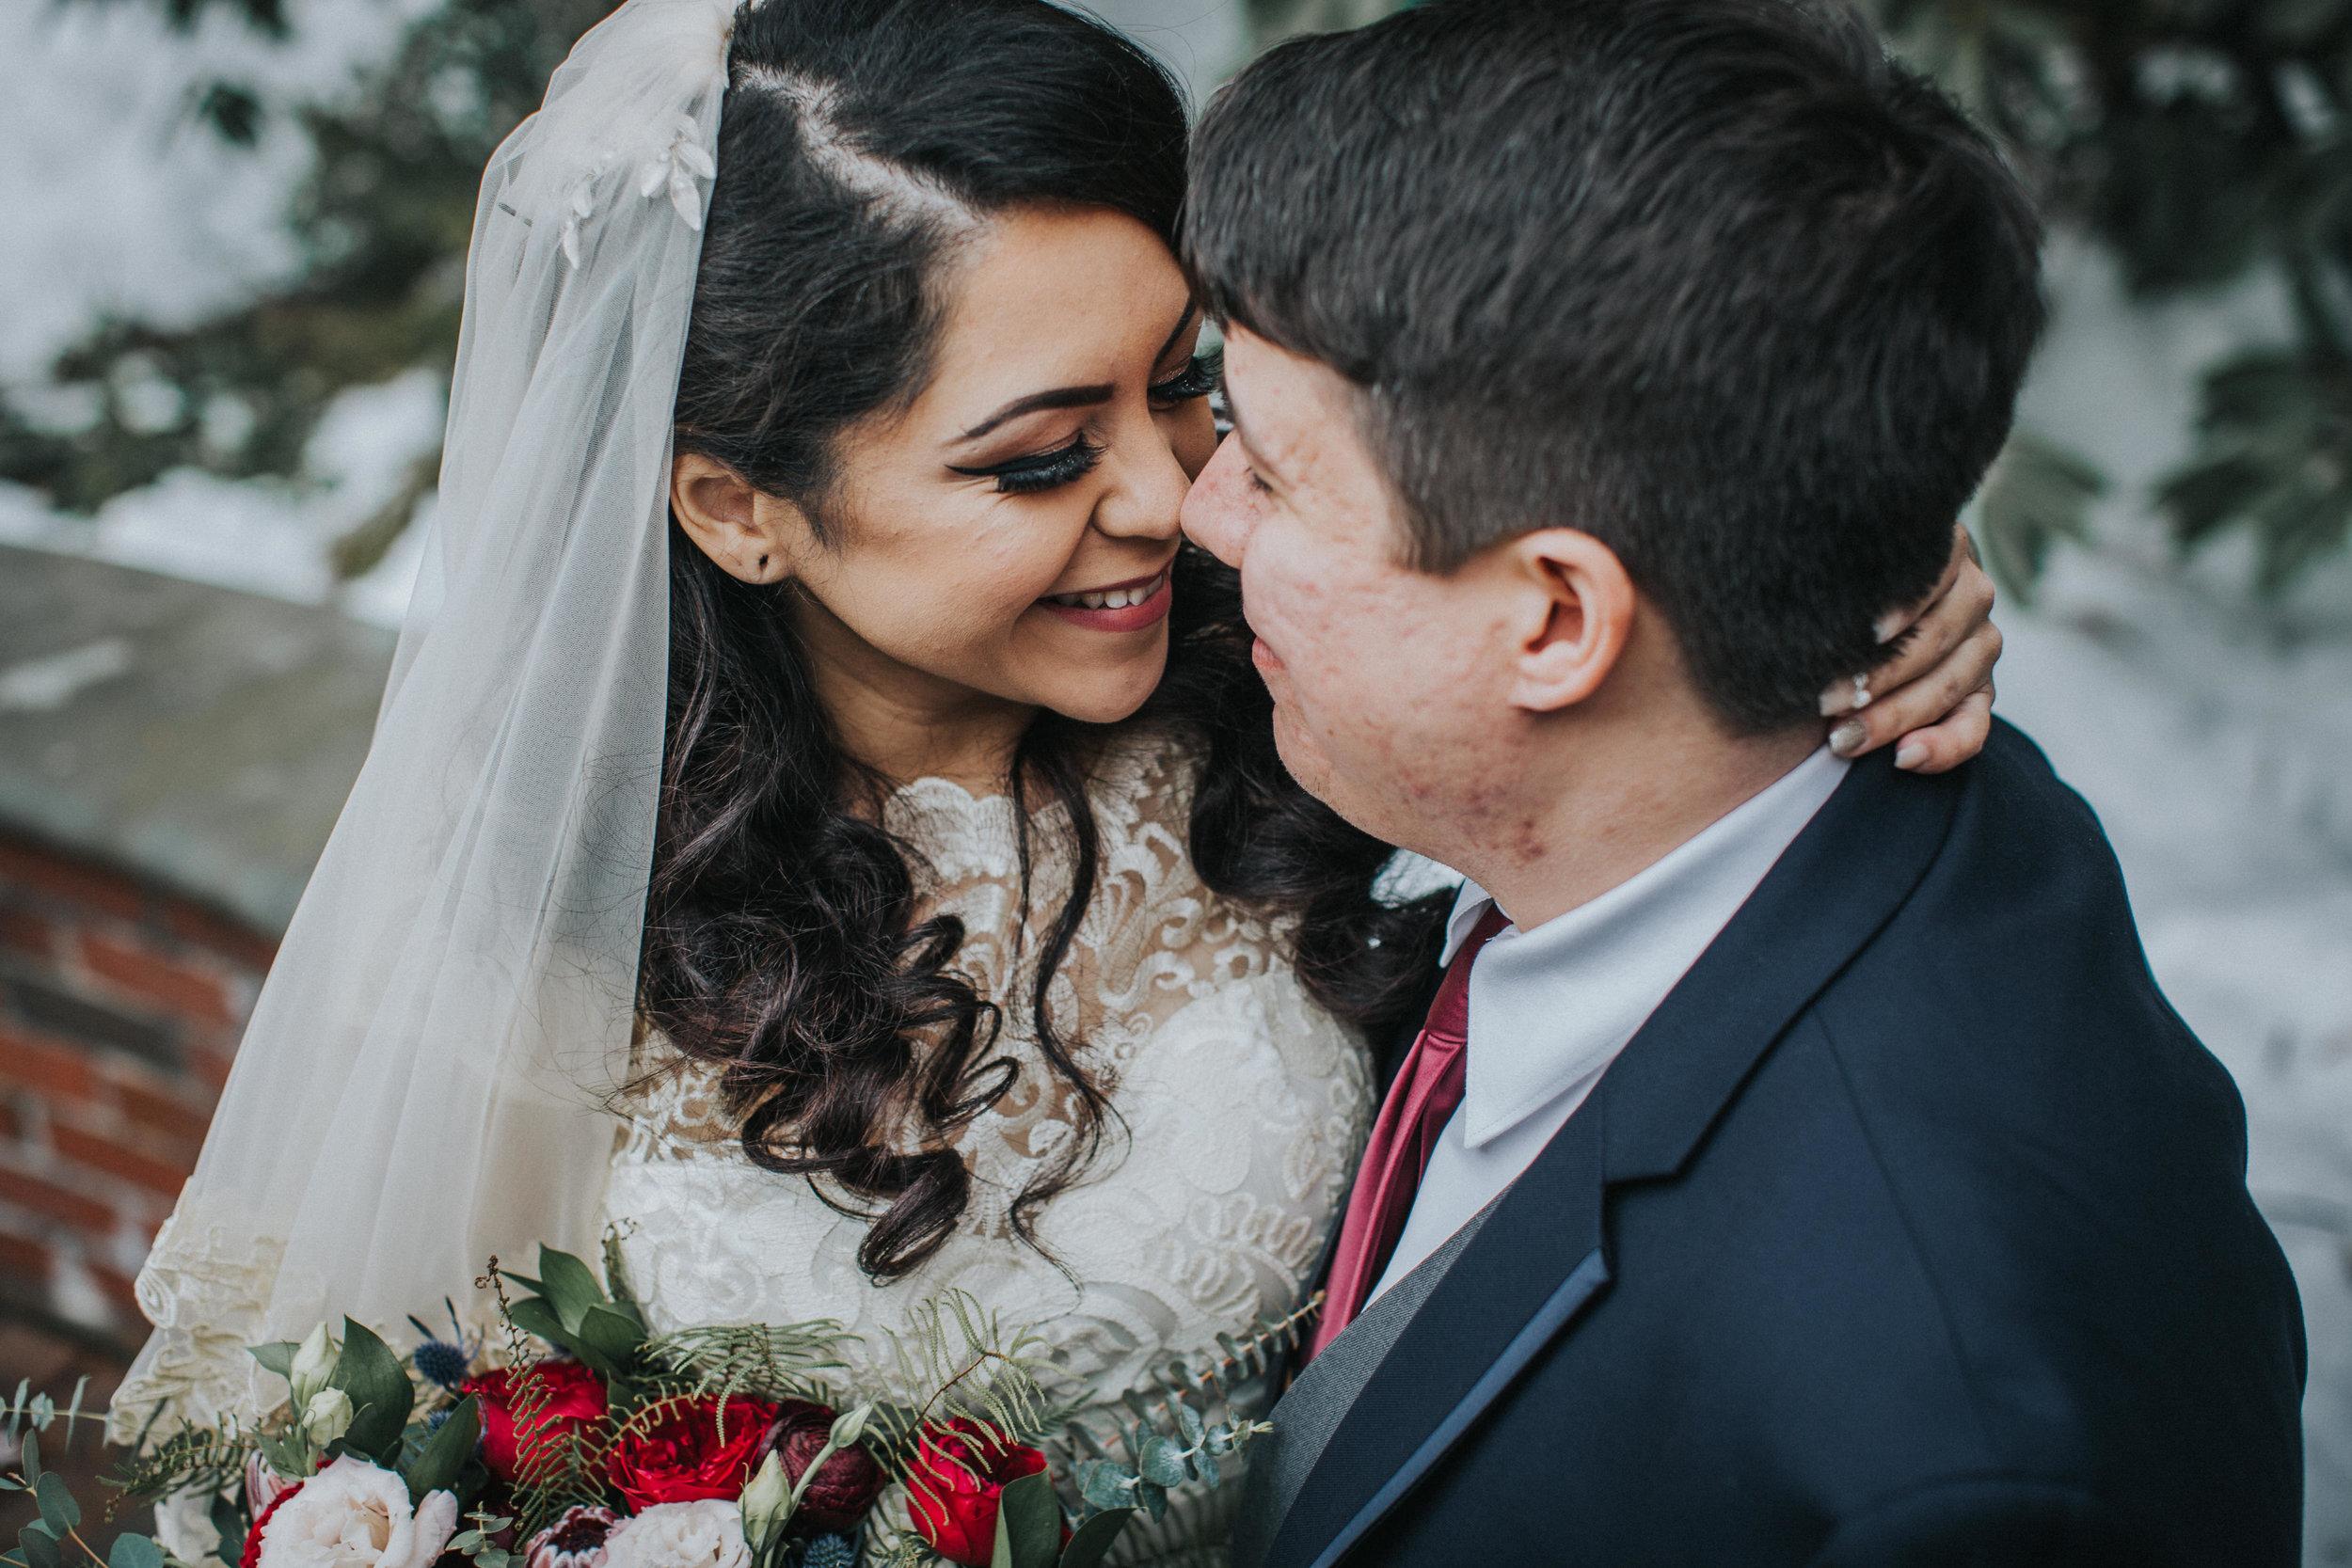 New-Jersey-Wedding-Photographer-ReceptionCenter-Valeria&Mike-First-Look-Bride&Groom (27 of 69).jpg